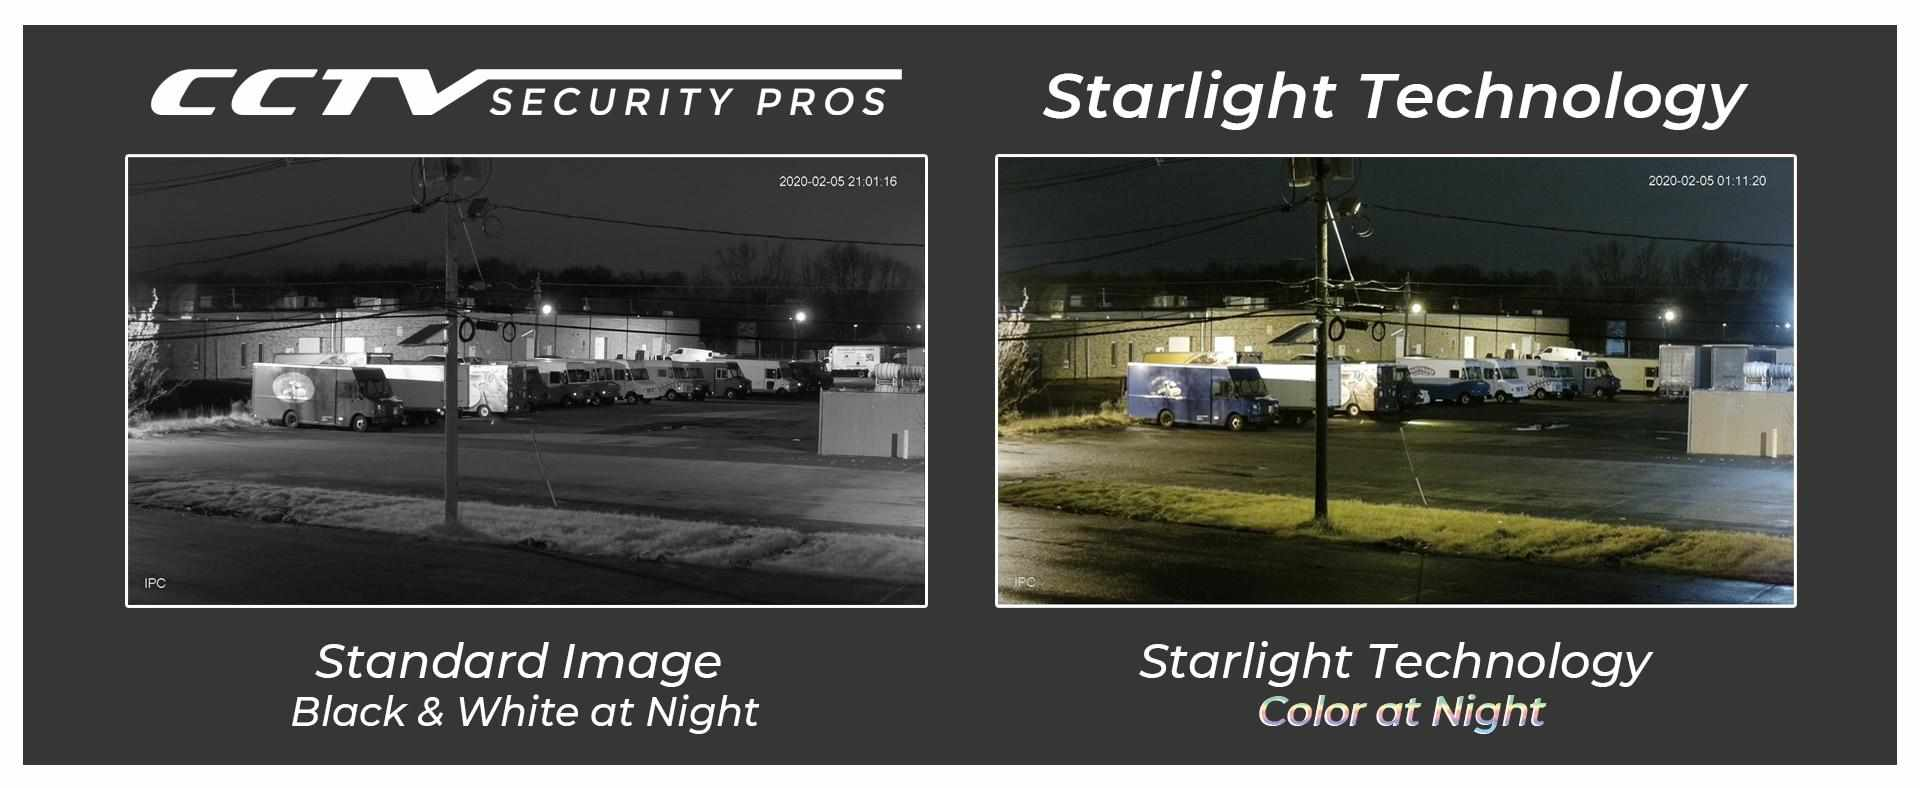 starlight-technology-option.jpeg